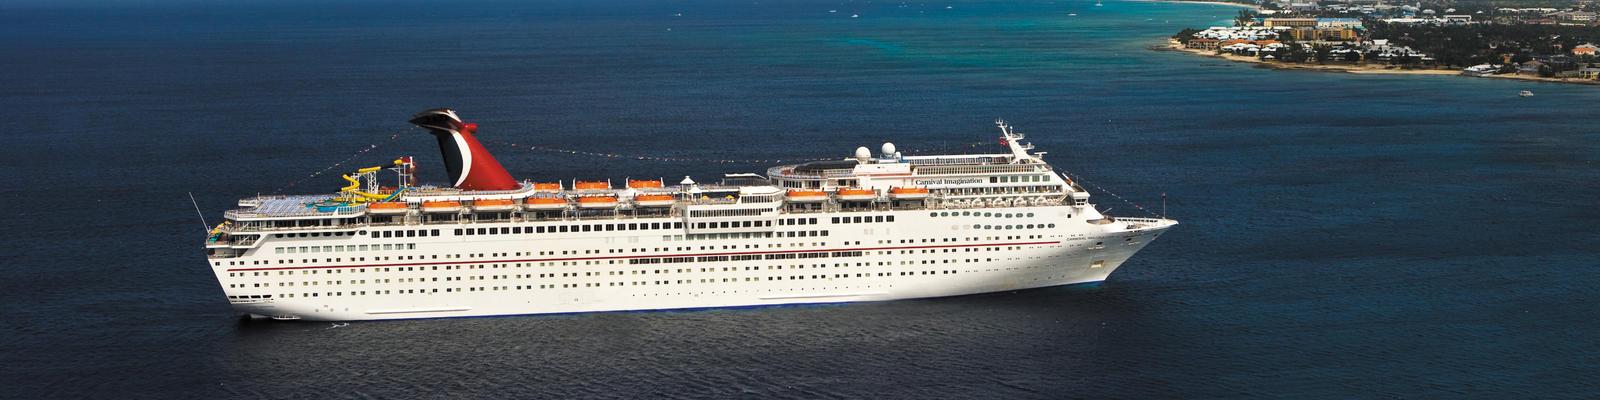 Carnival Imagination Photo Carnival Cruise Line Carnival